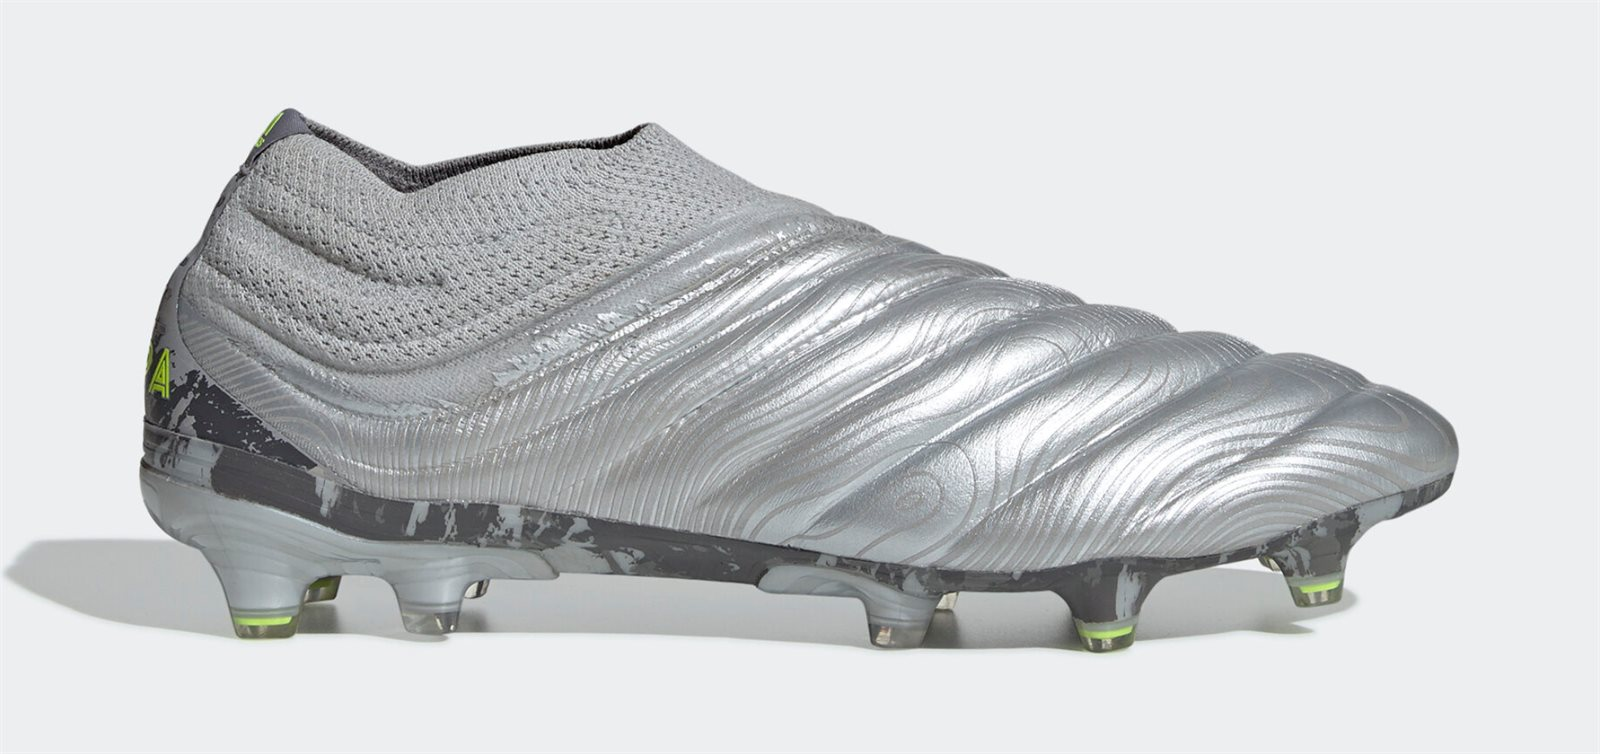 exquisite design classic new styles Chaussures de football de Paulo Dybala